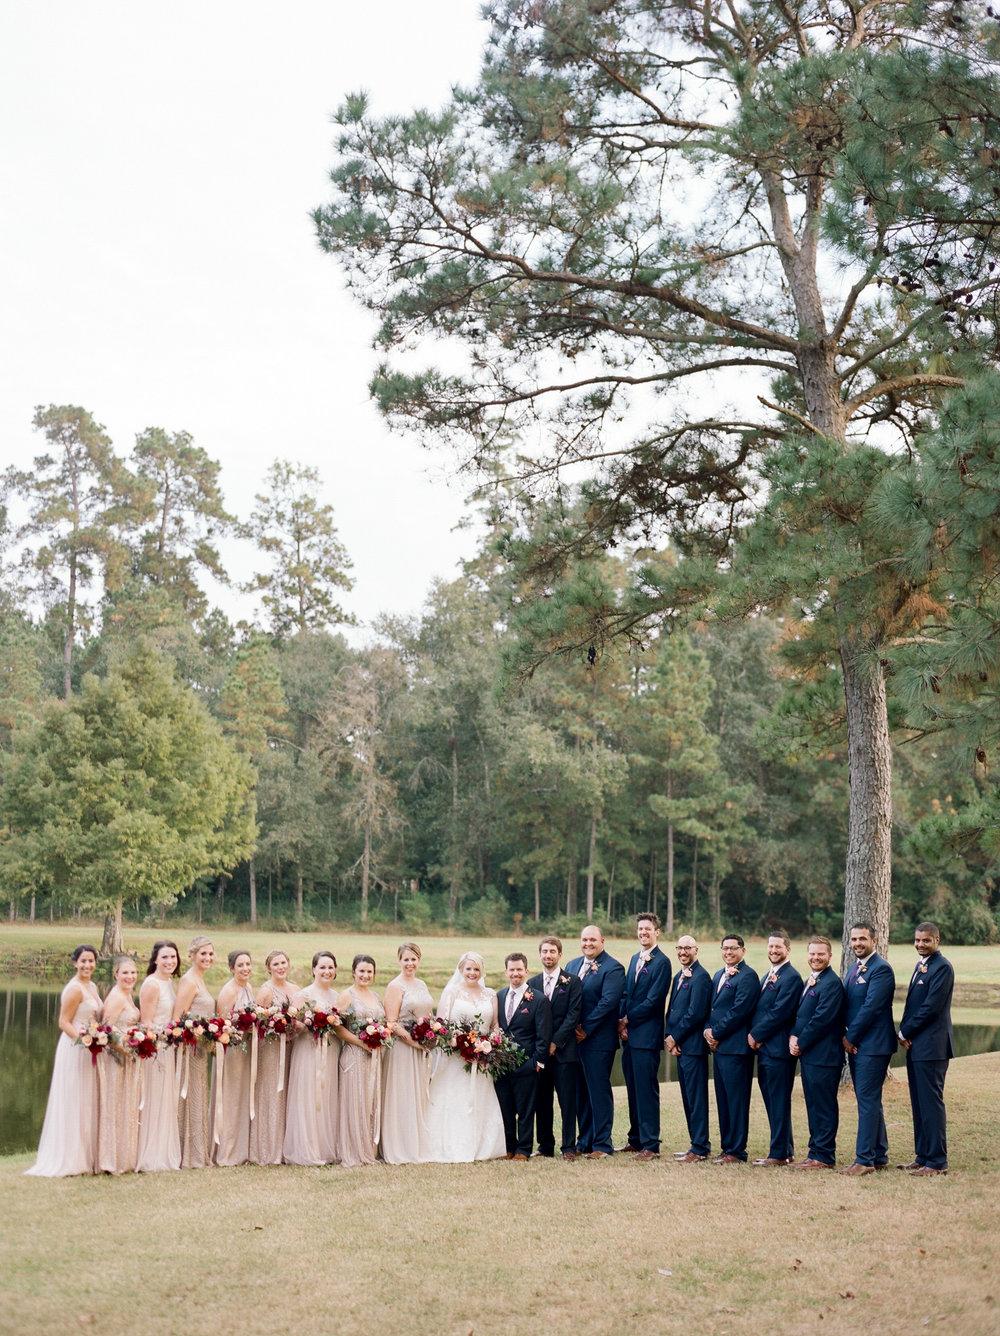 Houston-Wedding-Photographer-Fine-Art-Film-Destination-Style-Me-Pretty-Austin-Dallas-New-Orleans-Dana-Fernandez-Photography-The Woodlands-Country-Club-11.jpg